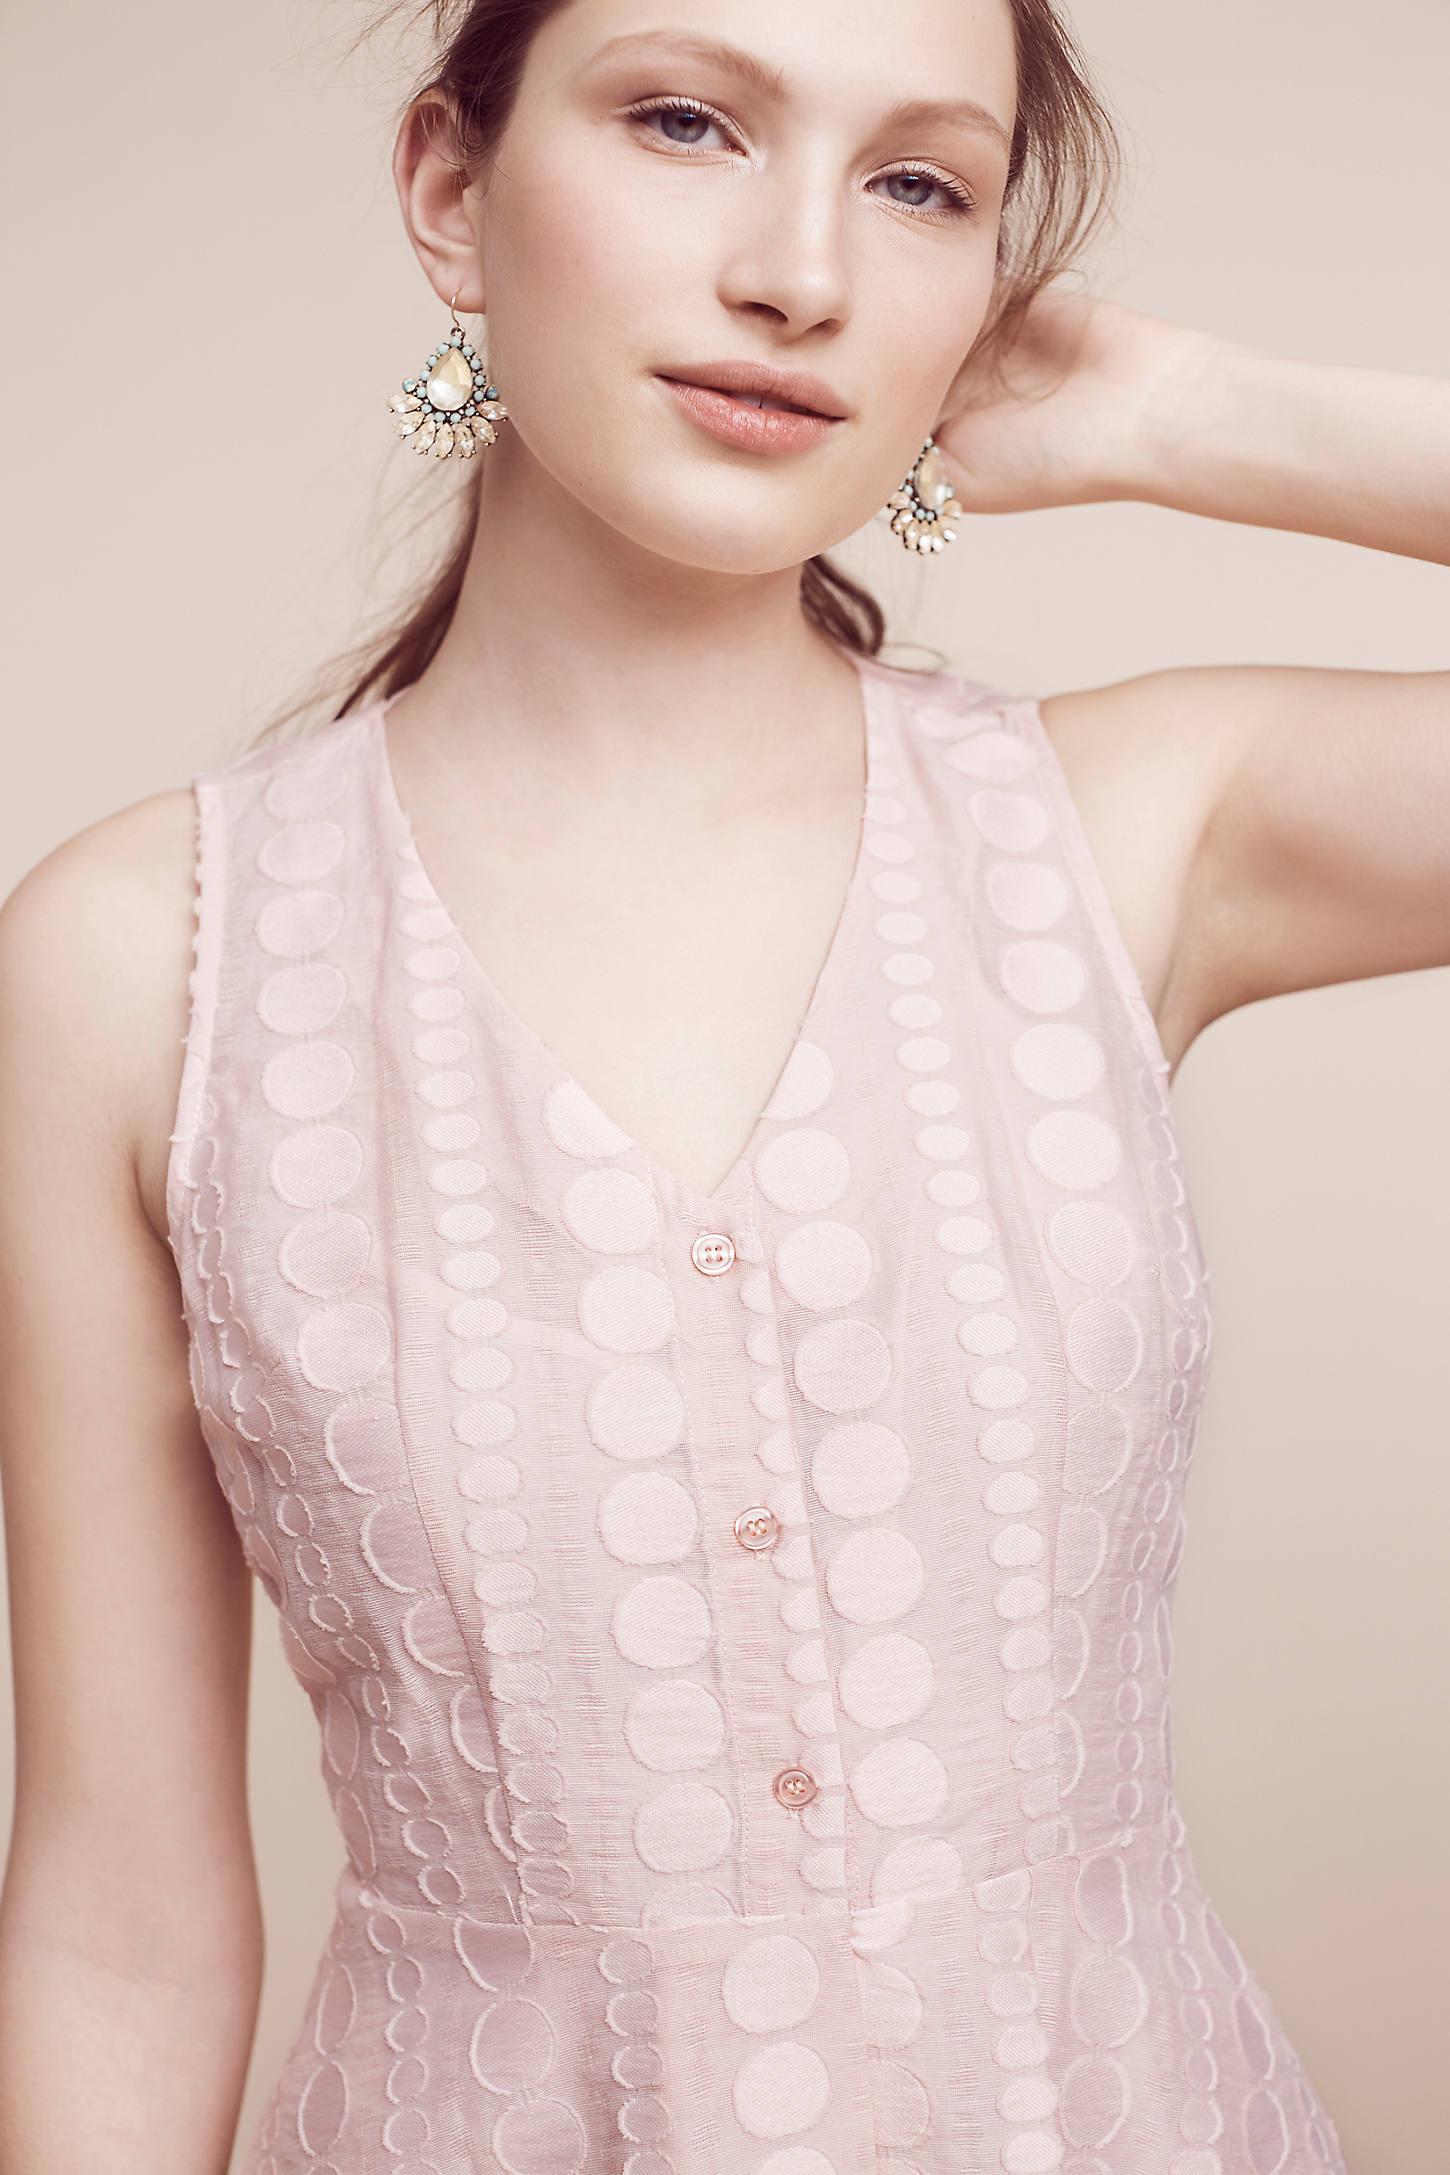 Petalla Textured Dress